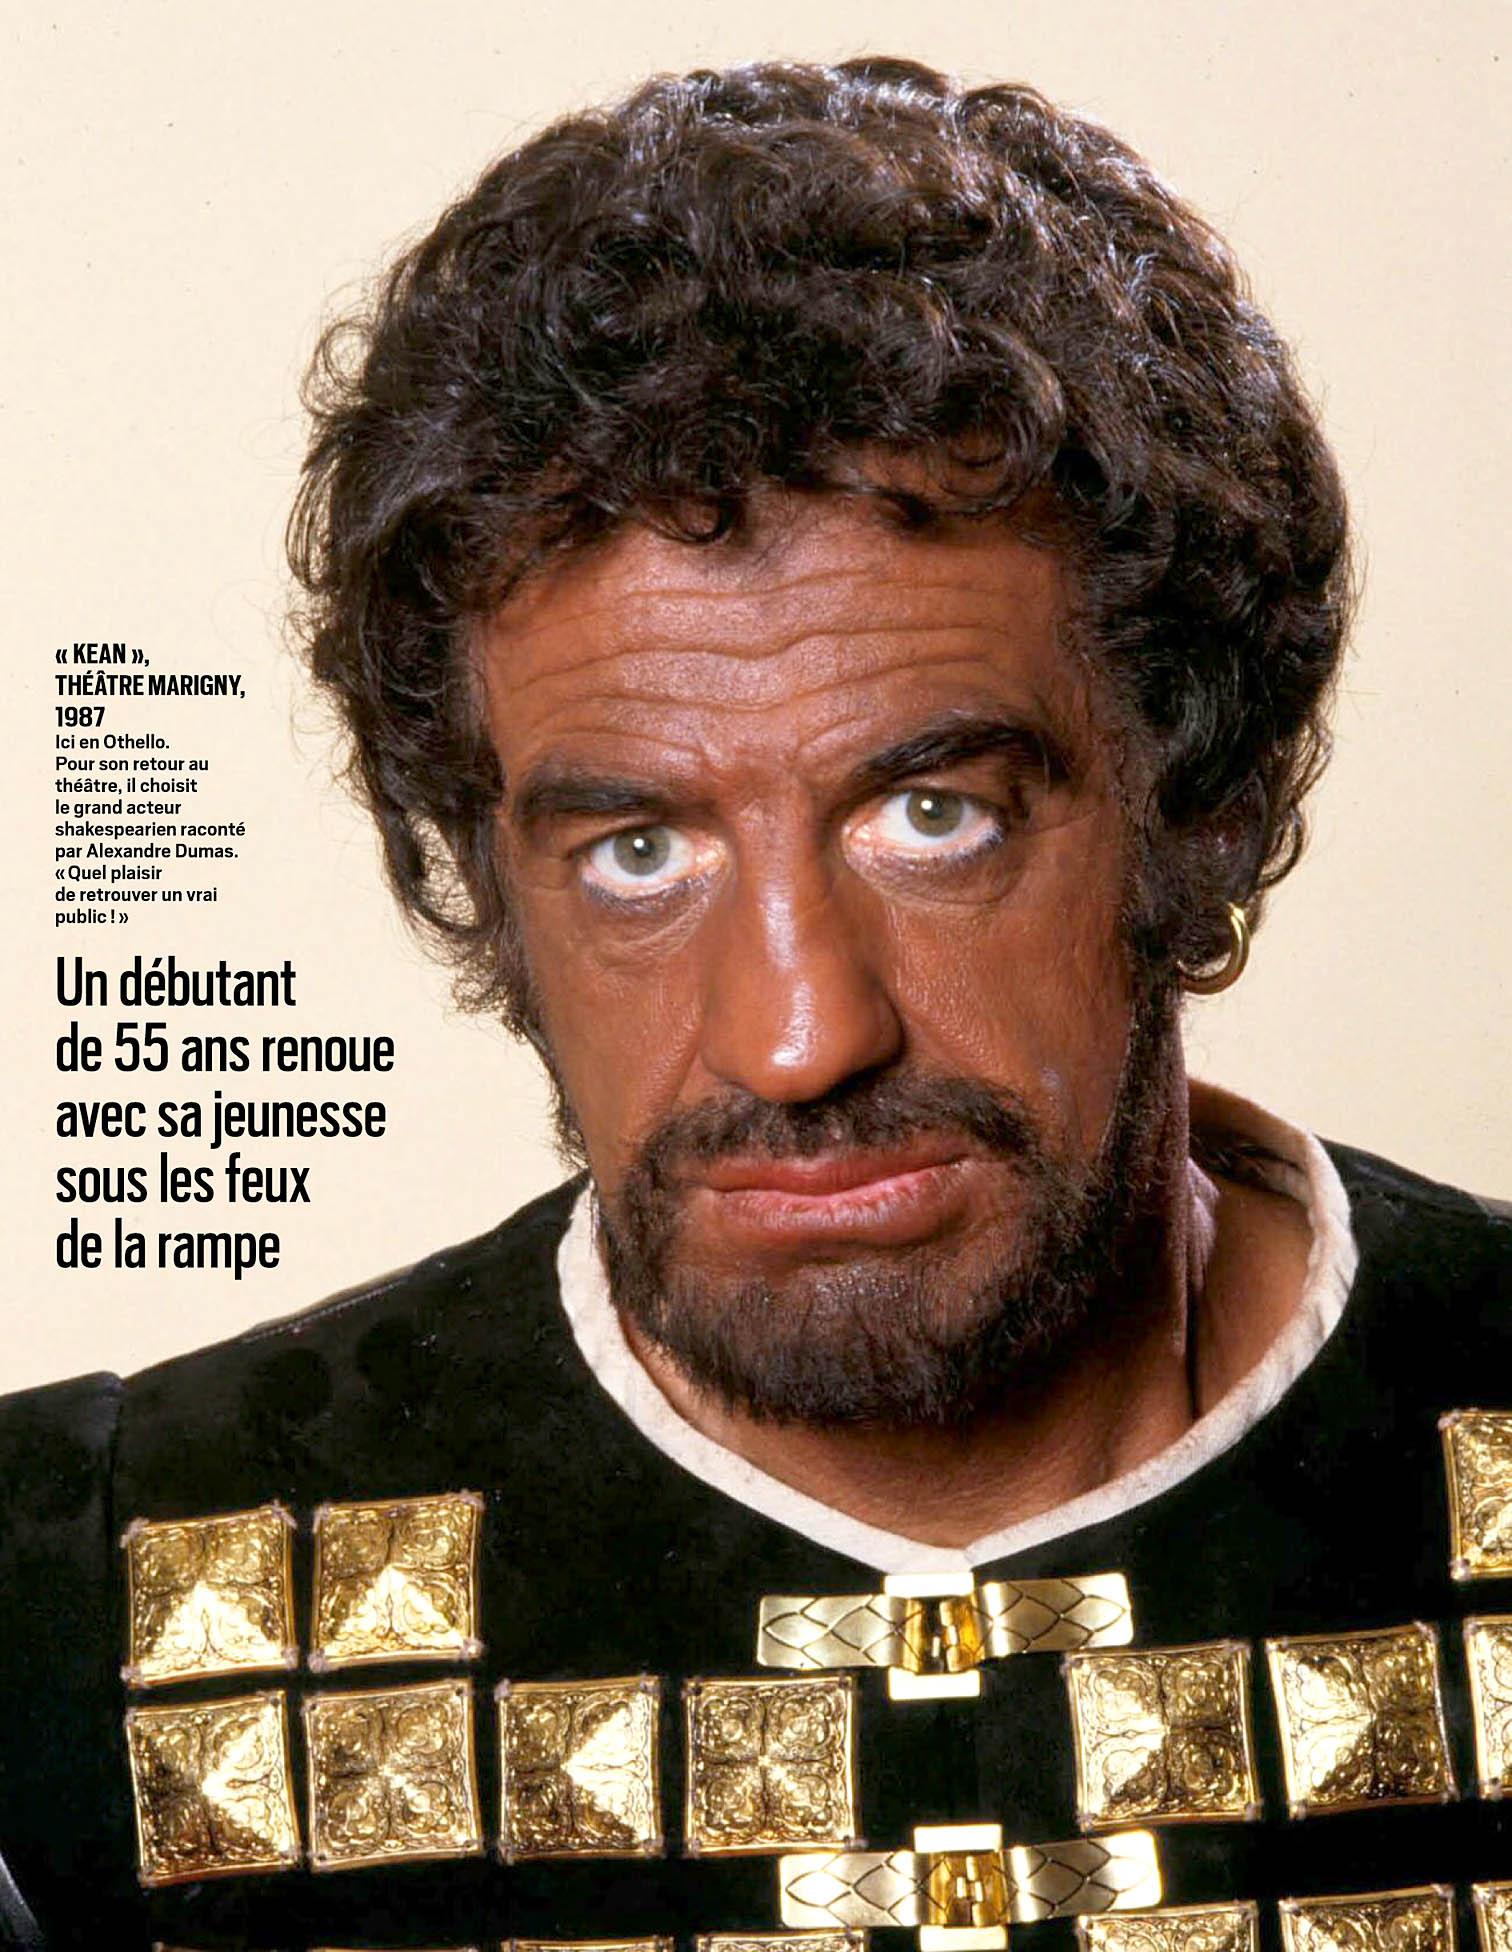 Paris Match 210909 Belmondo 41.jpg